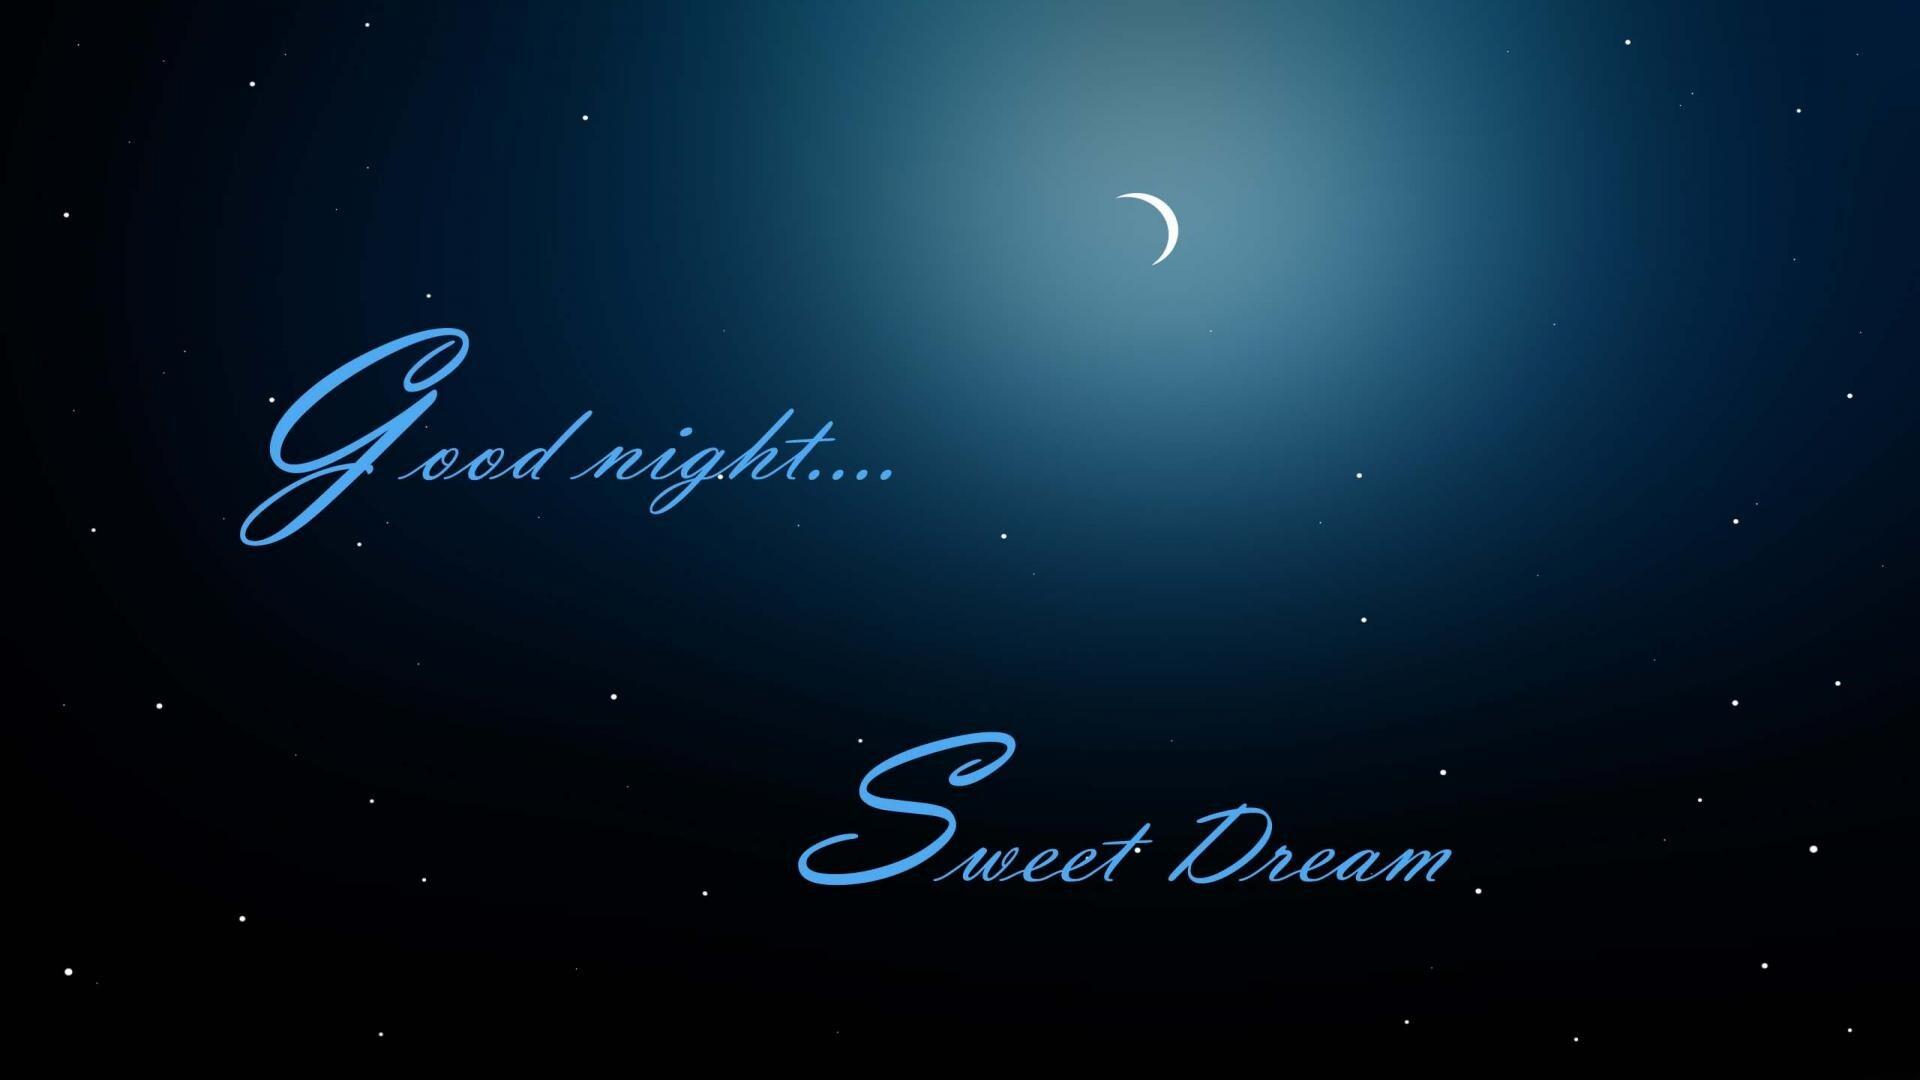 Good night sweet dreams greetings nice hd wallpapers hd wallpapers download voltagebd Choice Image